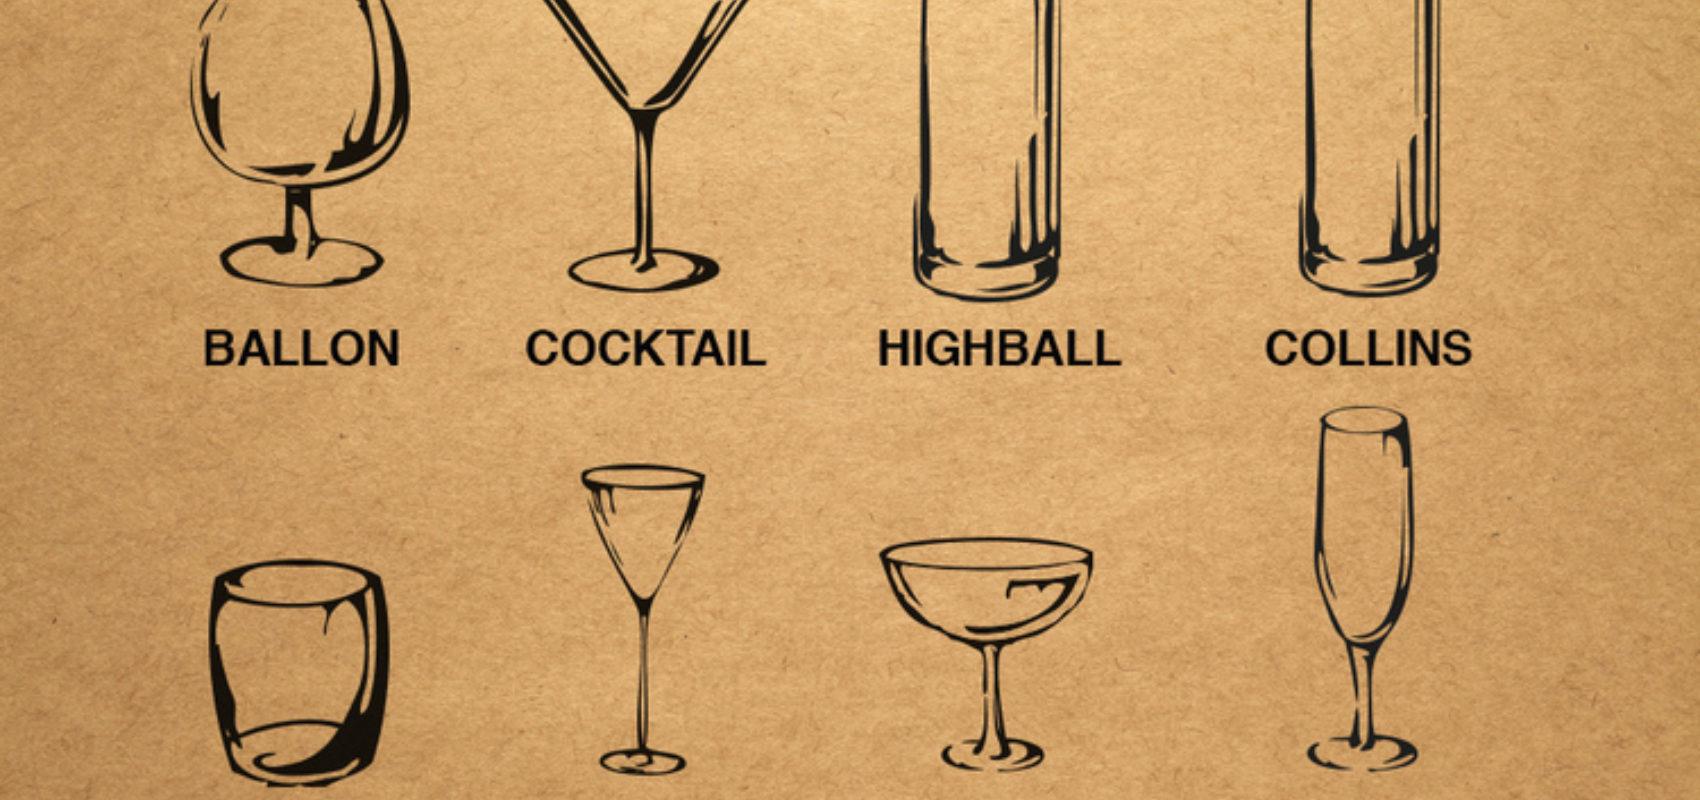 les differents types de verres